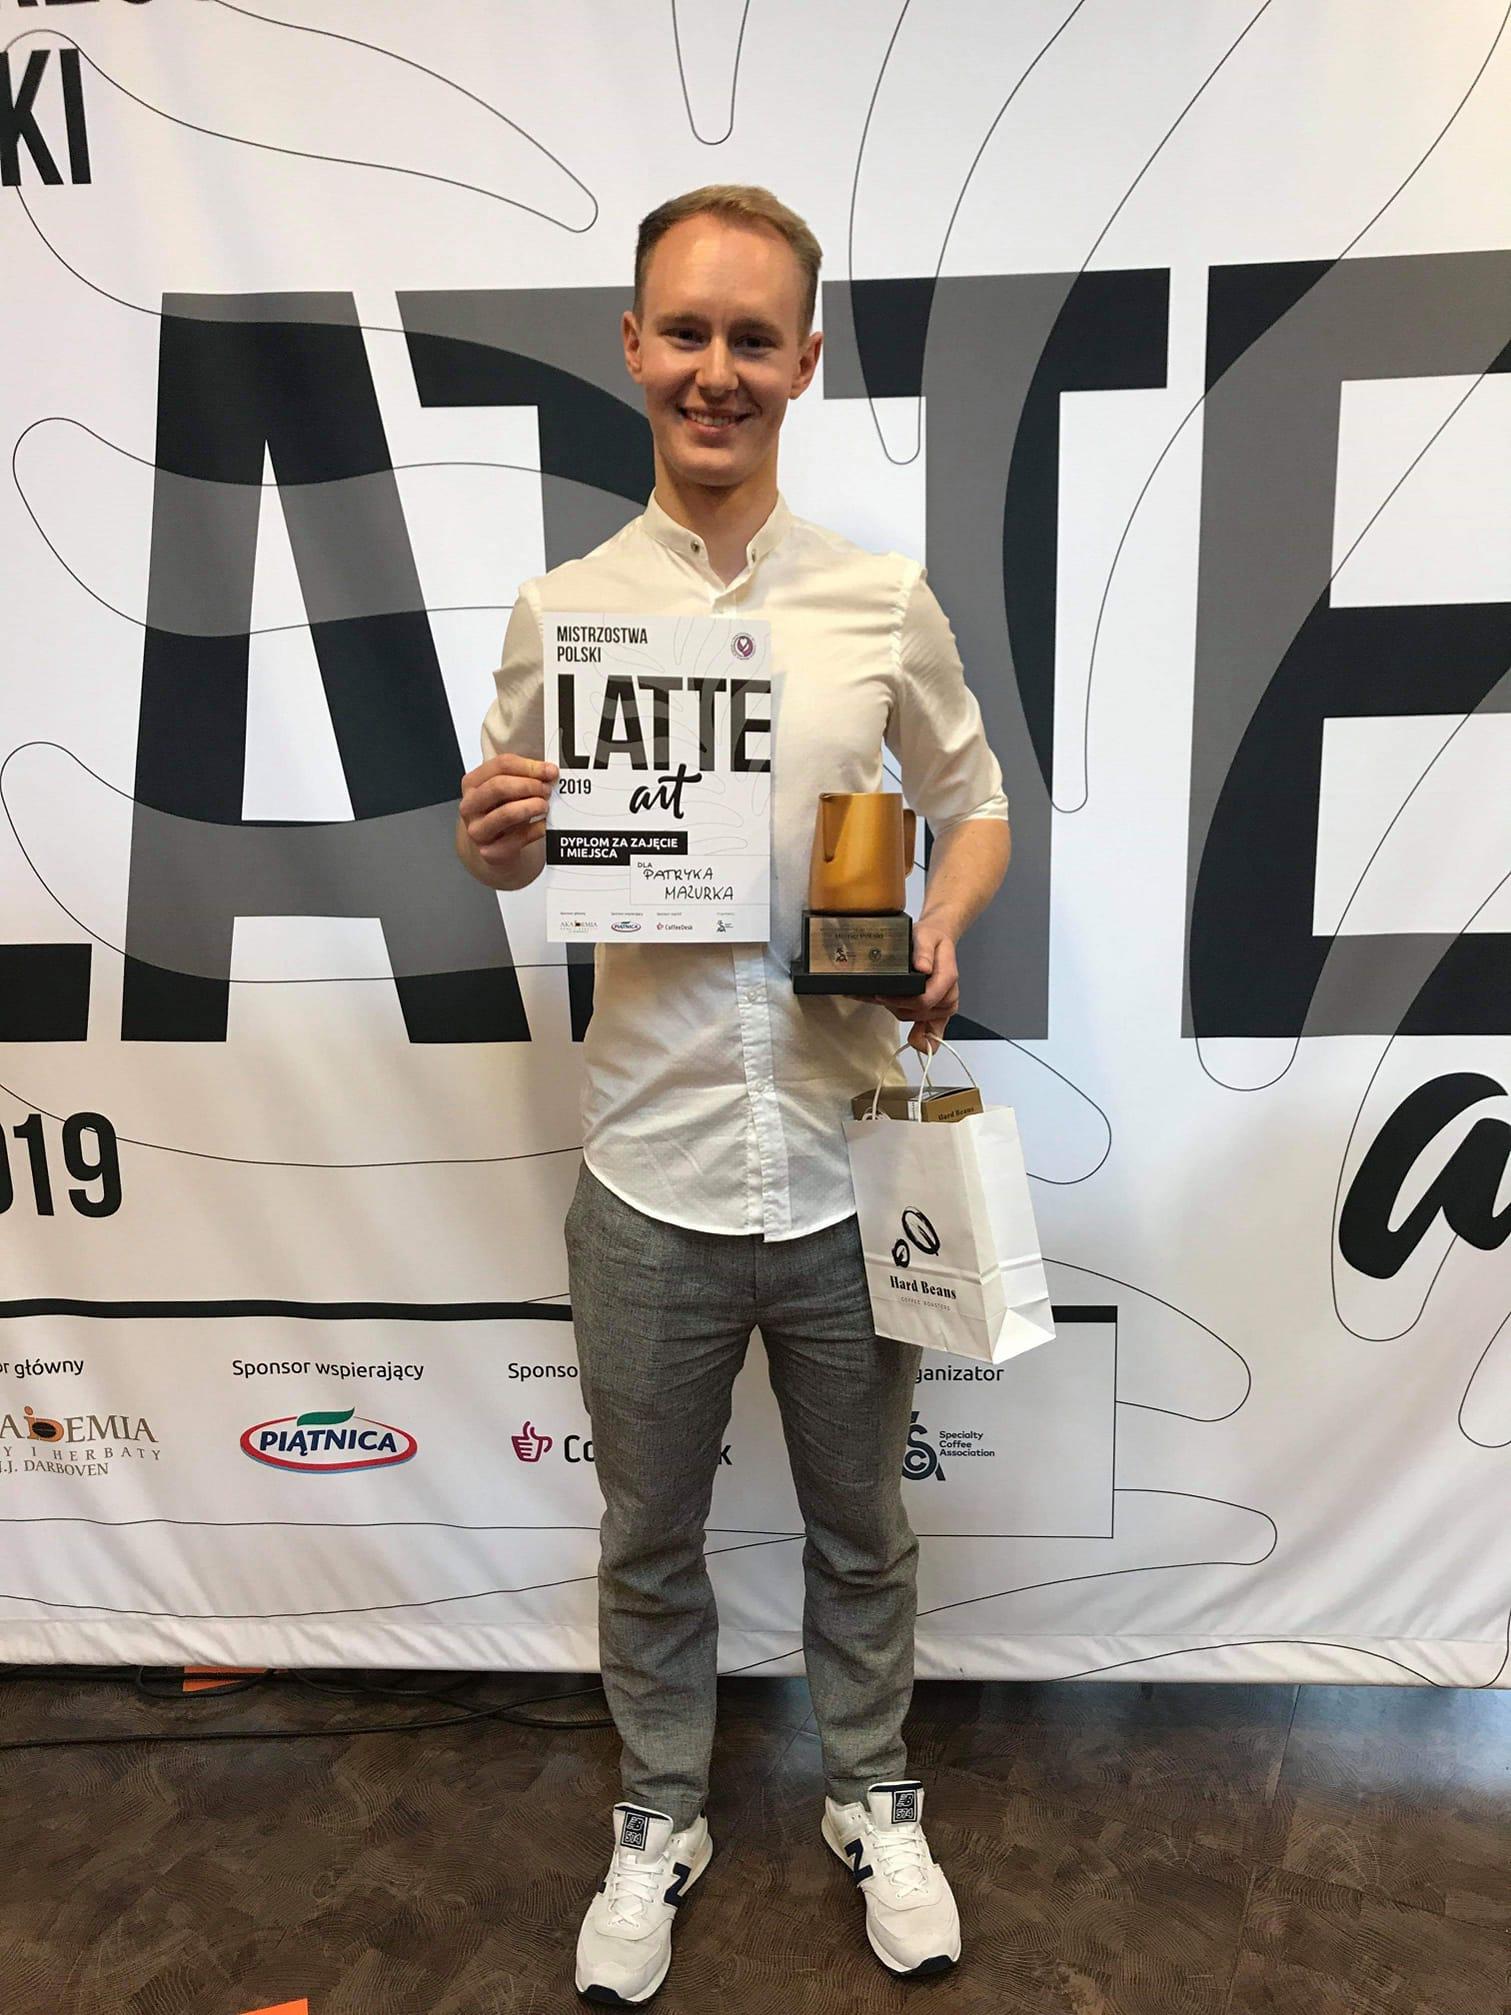 Mistrz Polski Latte Art 2019